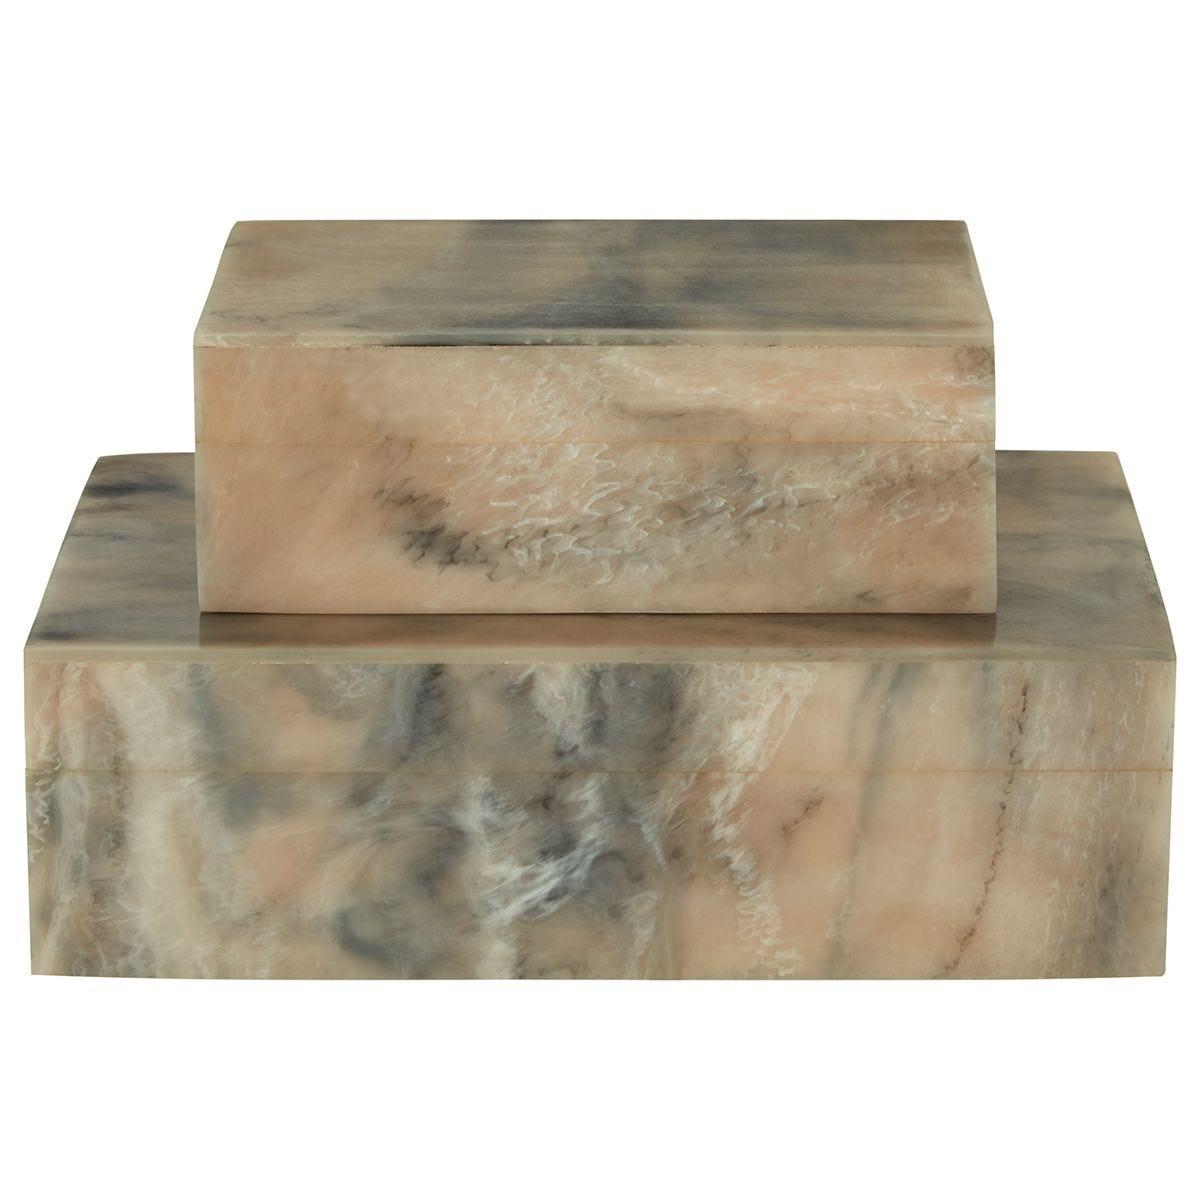 Premier Housewares Rosado Set of 2 Trinket Boxes - Marble Finish